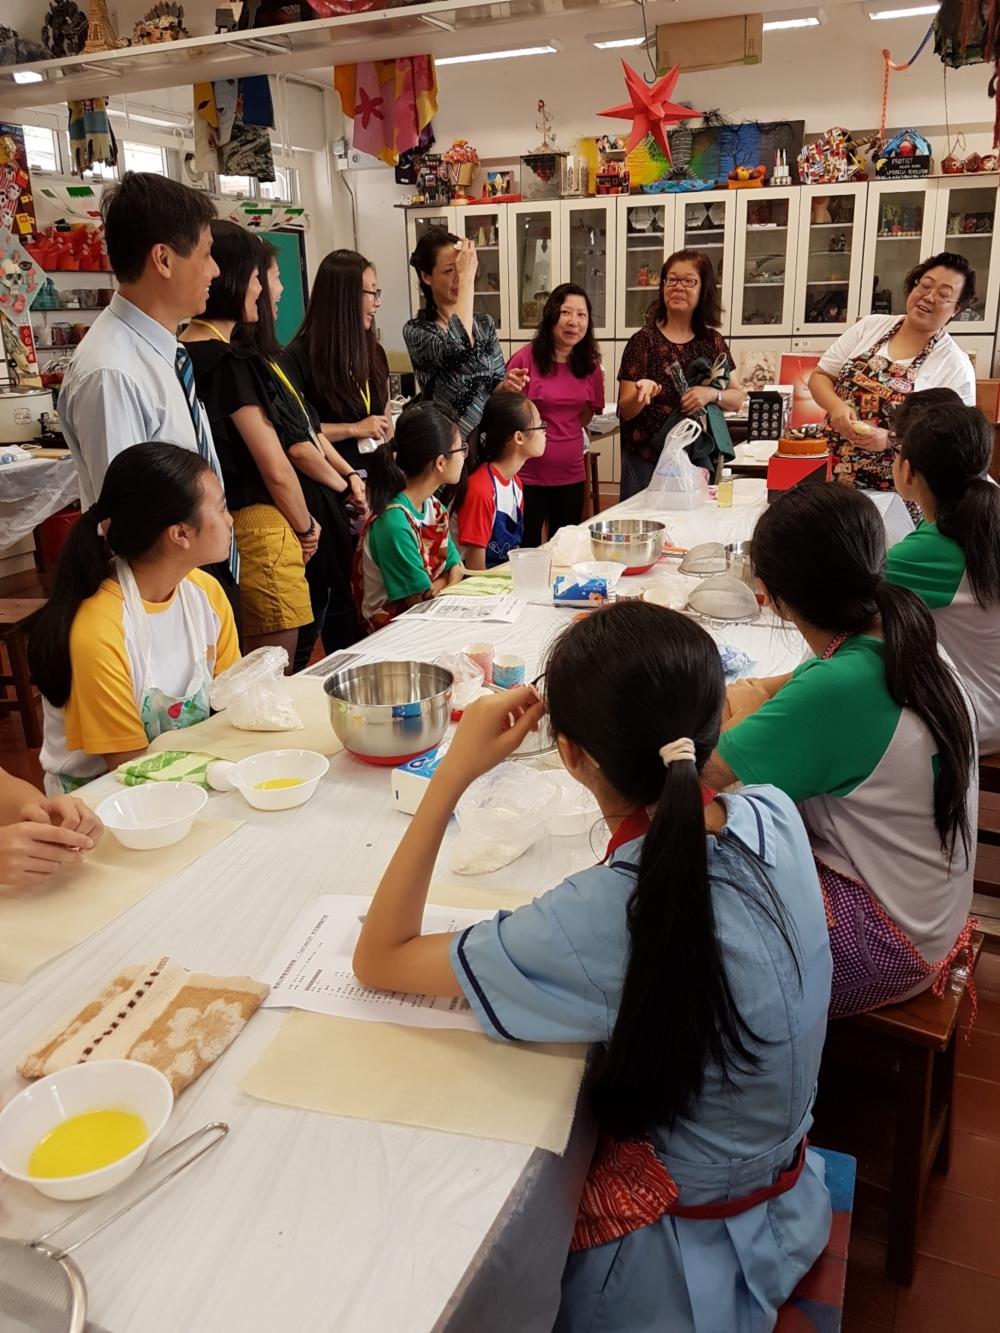 http://www.npc.edu.hk/sites/default/files/3_1166.jpg